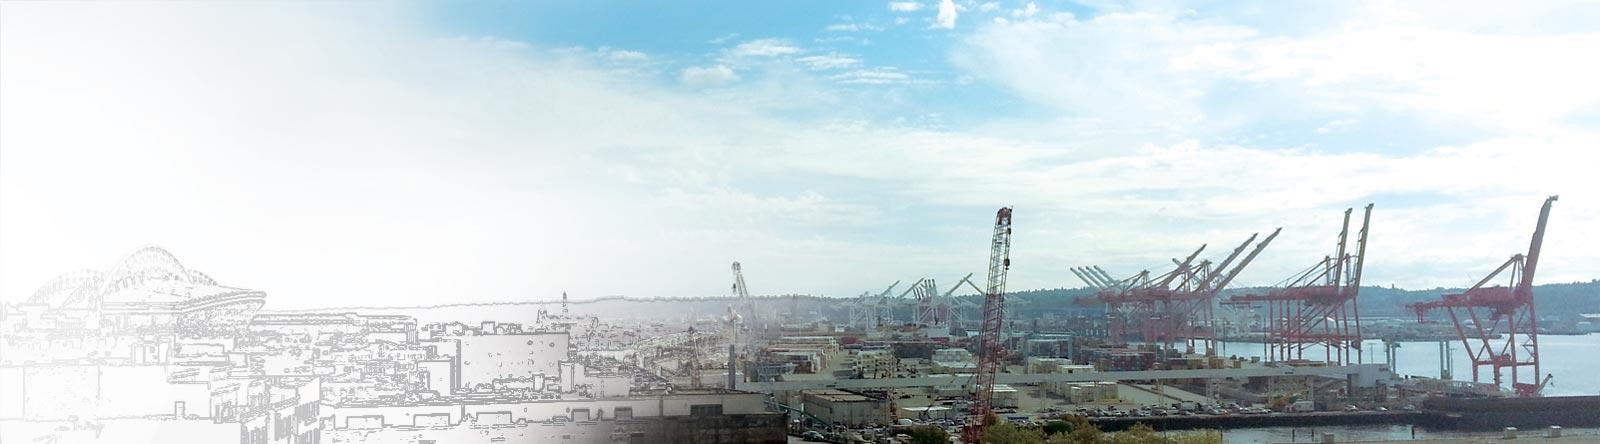 Port of Seattle cranes